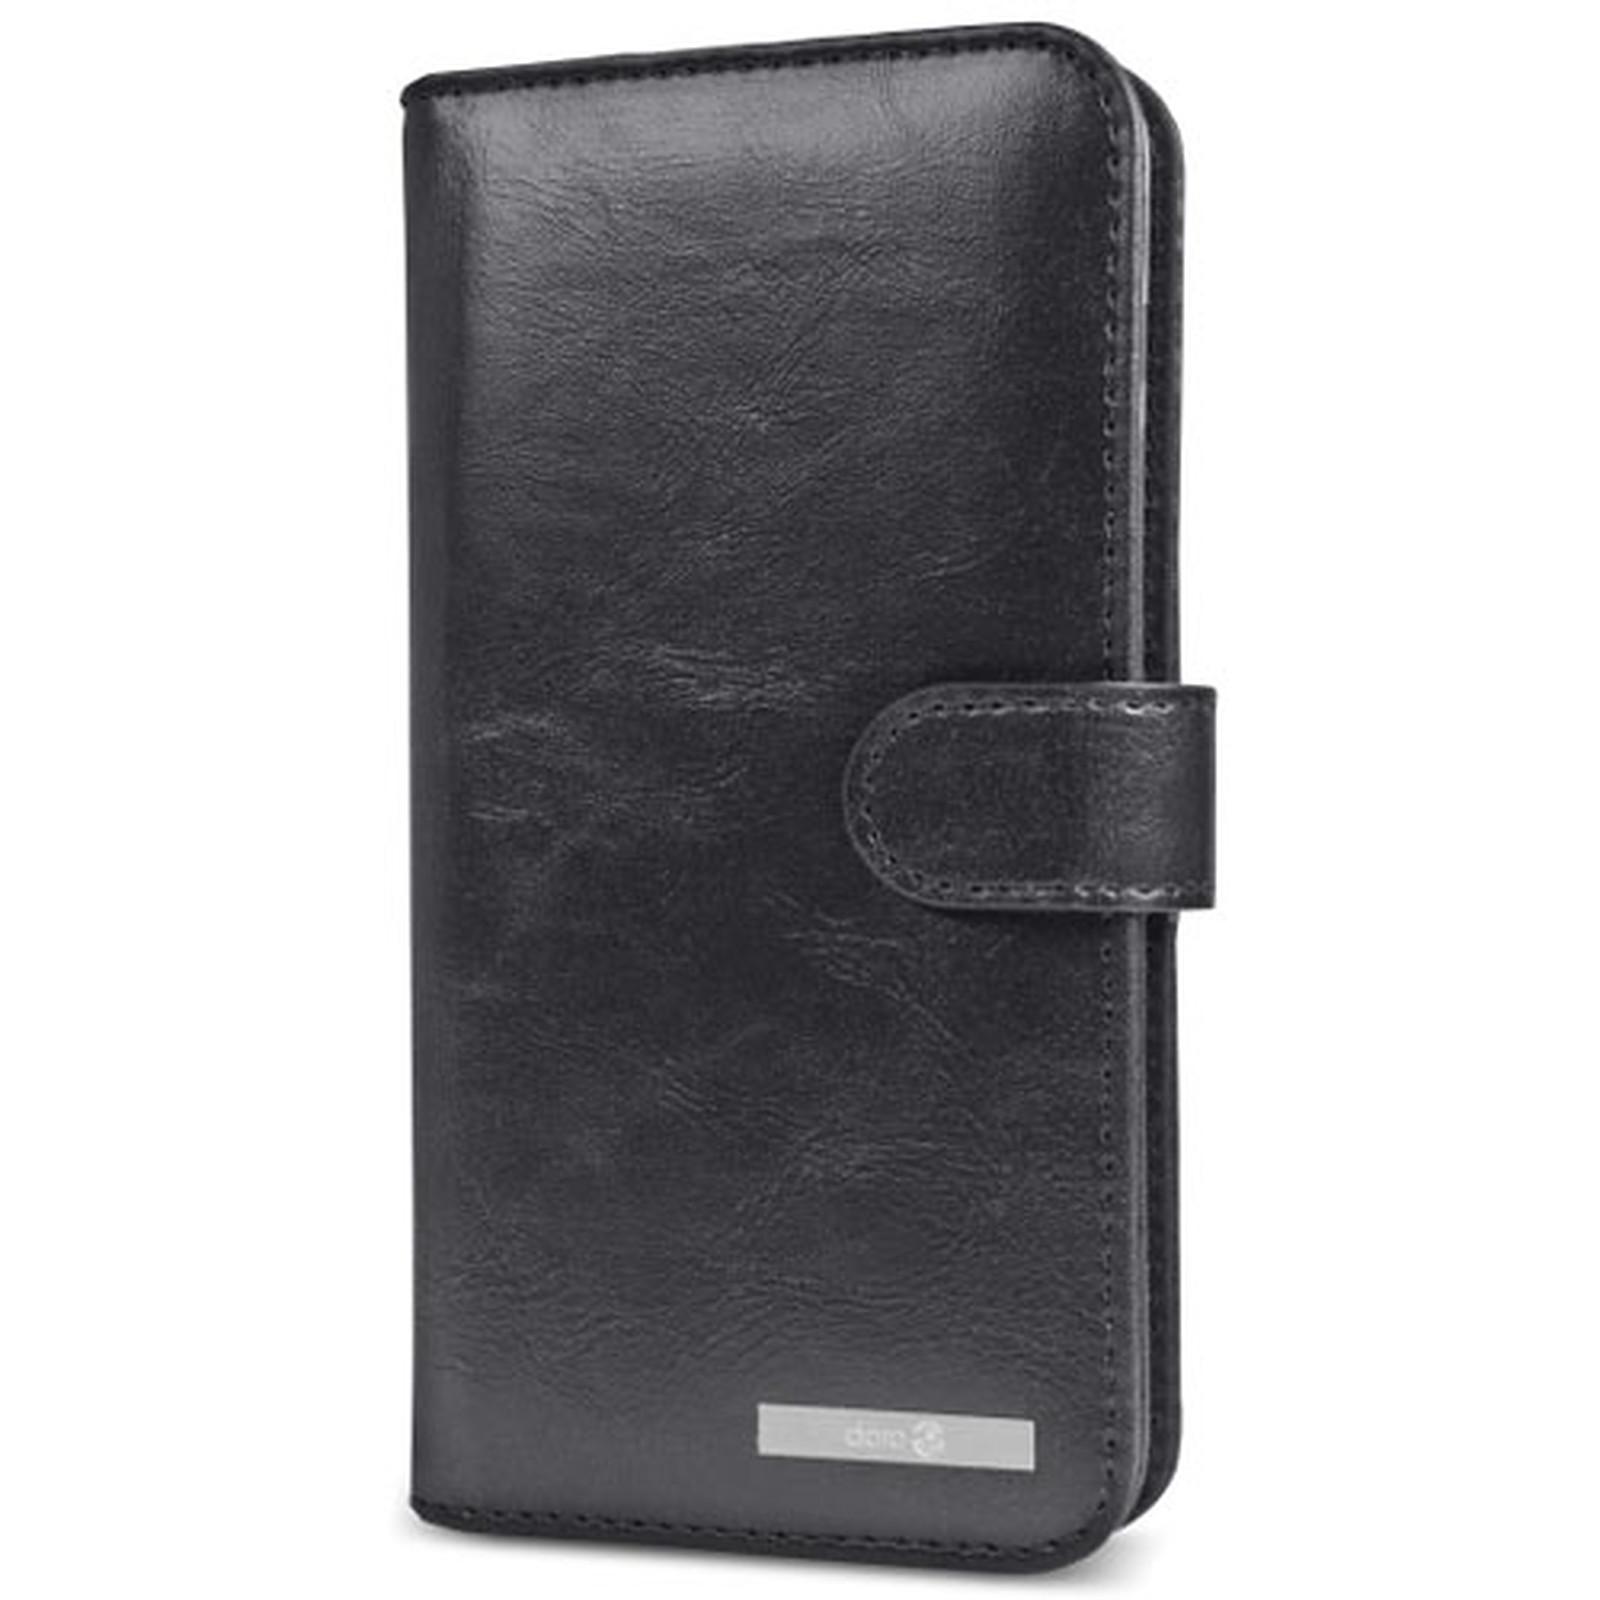 Doro Wallet Case Noir 8035